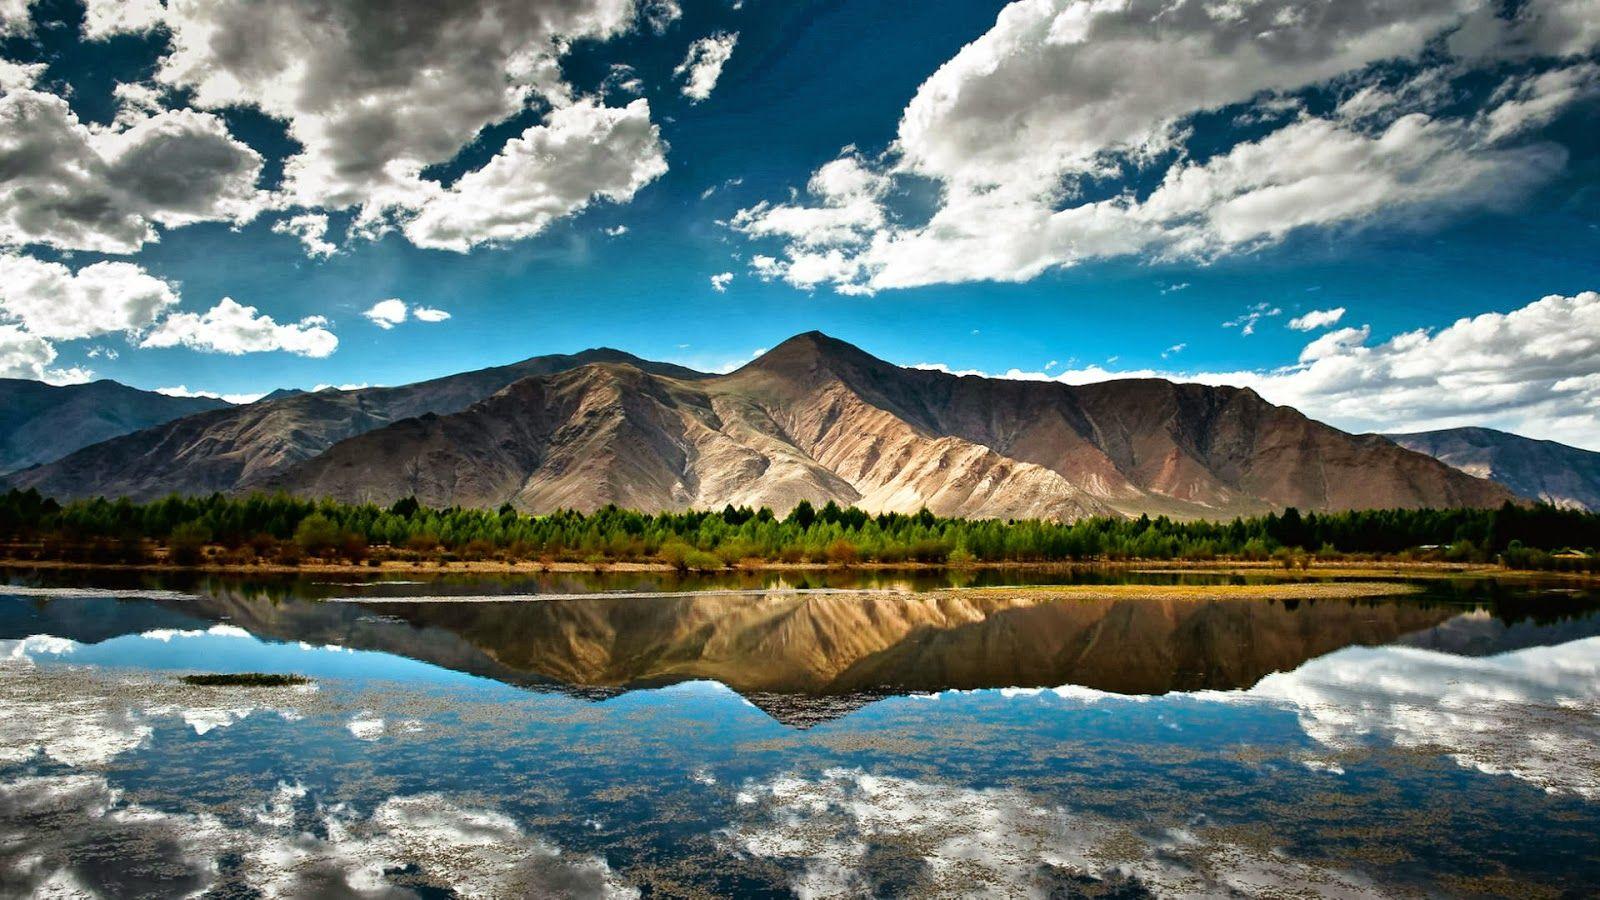 Lake+in+Tibet.jpg (1600×900)